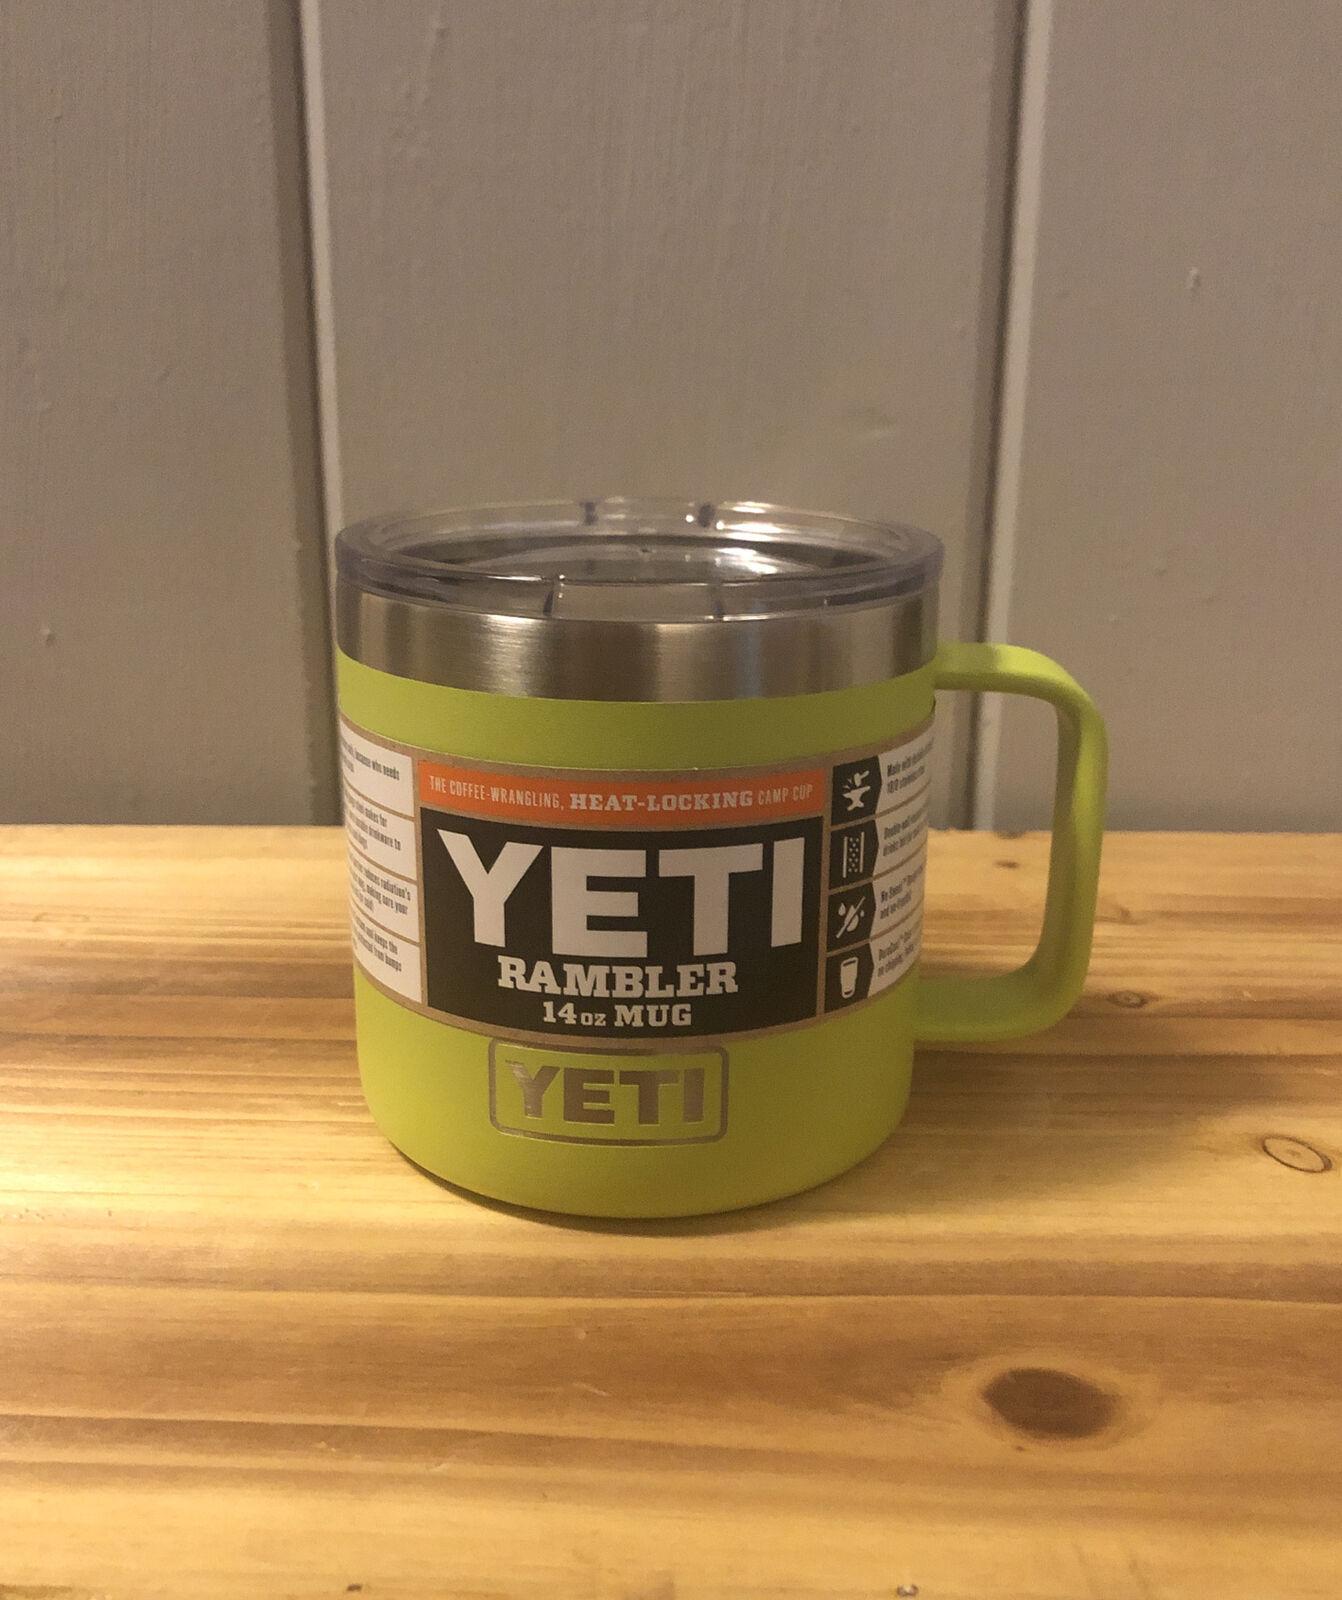 Yeti Rambler Harbor Pink Mug Stainless Insulated Cup Tumbler 14oz Lid Ymug14 For Sale Online Ebay